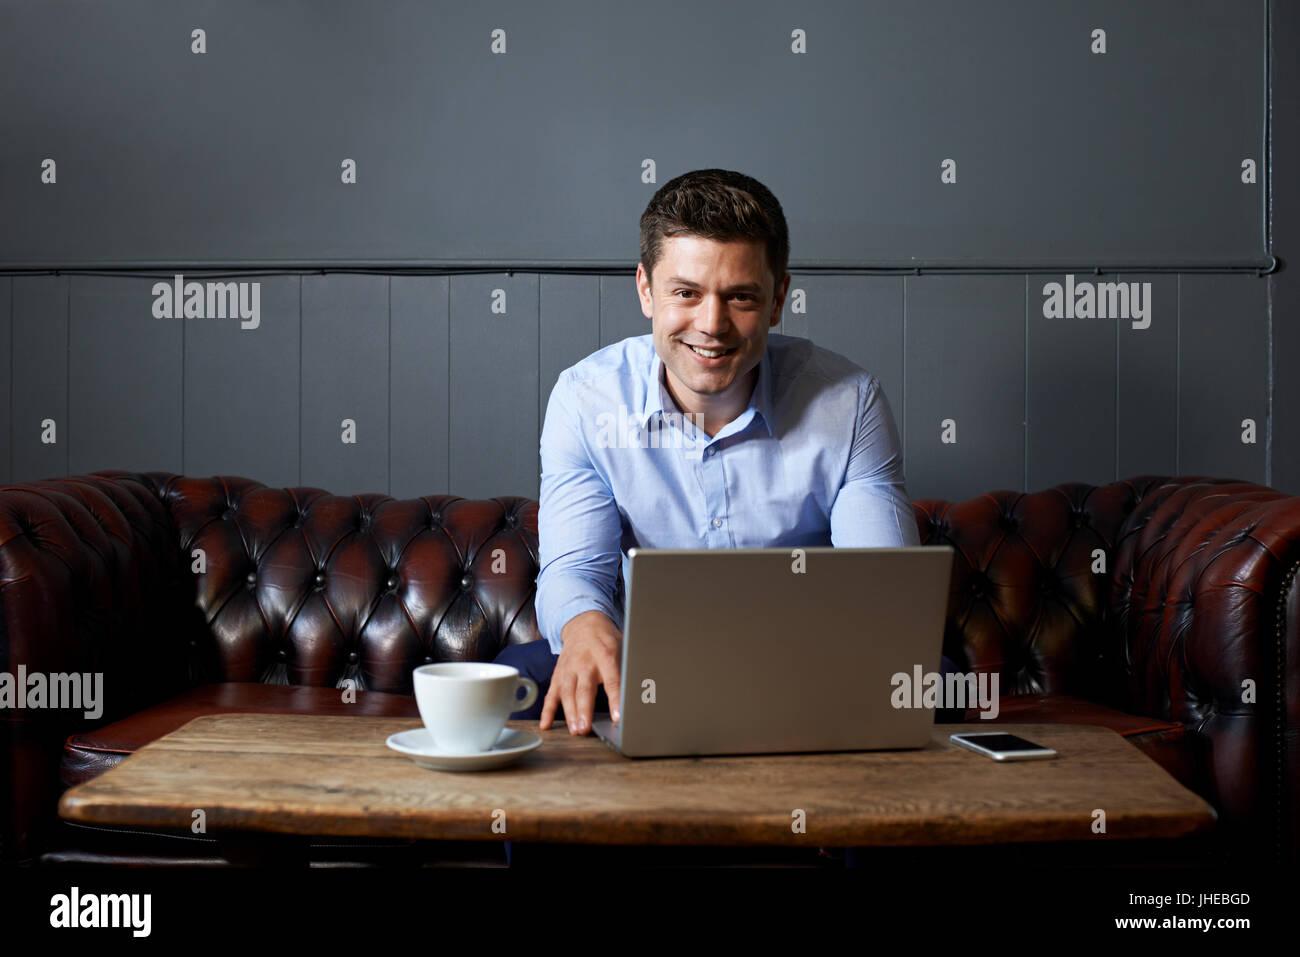 Porträt der Geschäftsmann arbeiten am Laptop im Internet-Cafe Stockbild